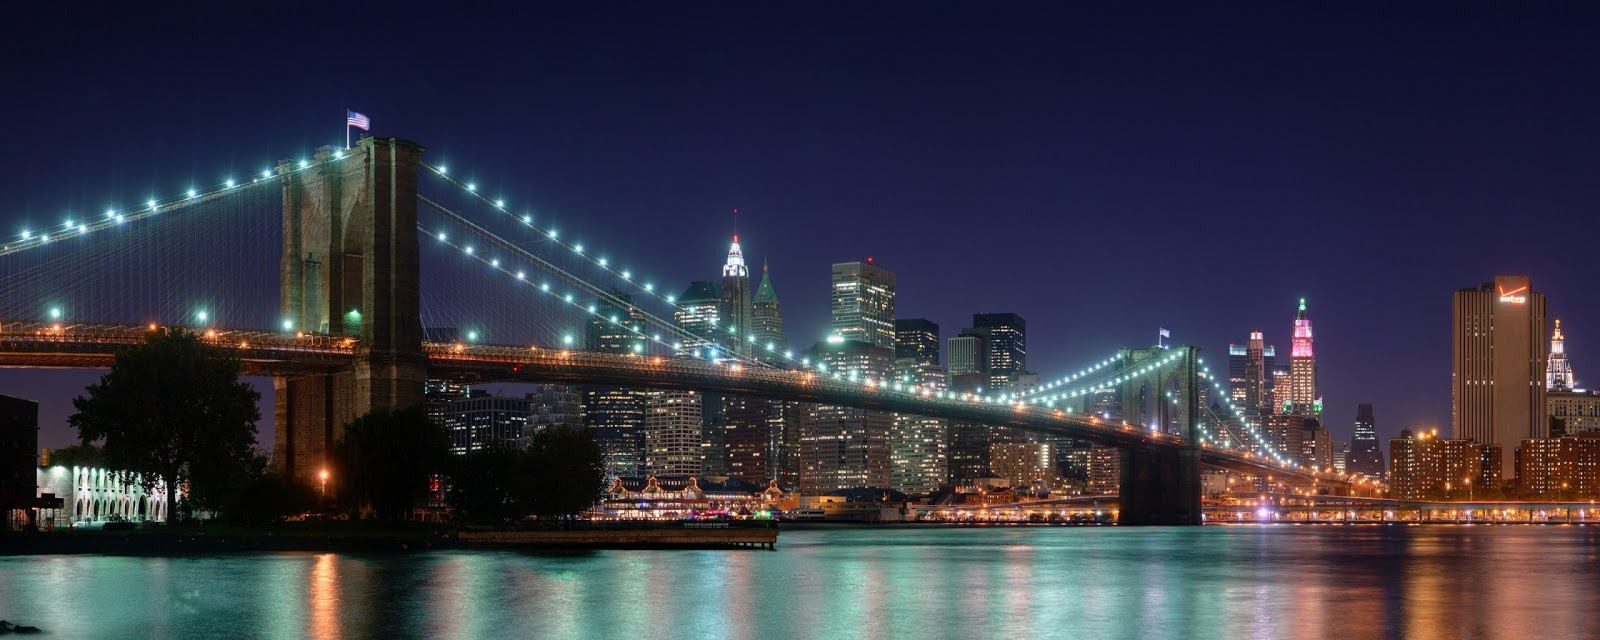 brooklyn bridge panorama dual monitor wallpapers - Brooklyn Bridge Panorama Dual Monitor Wallpapers HD